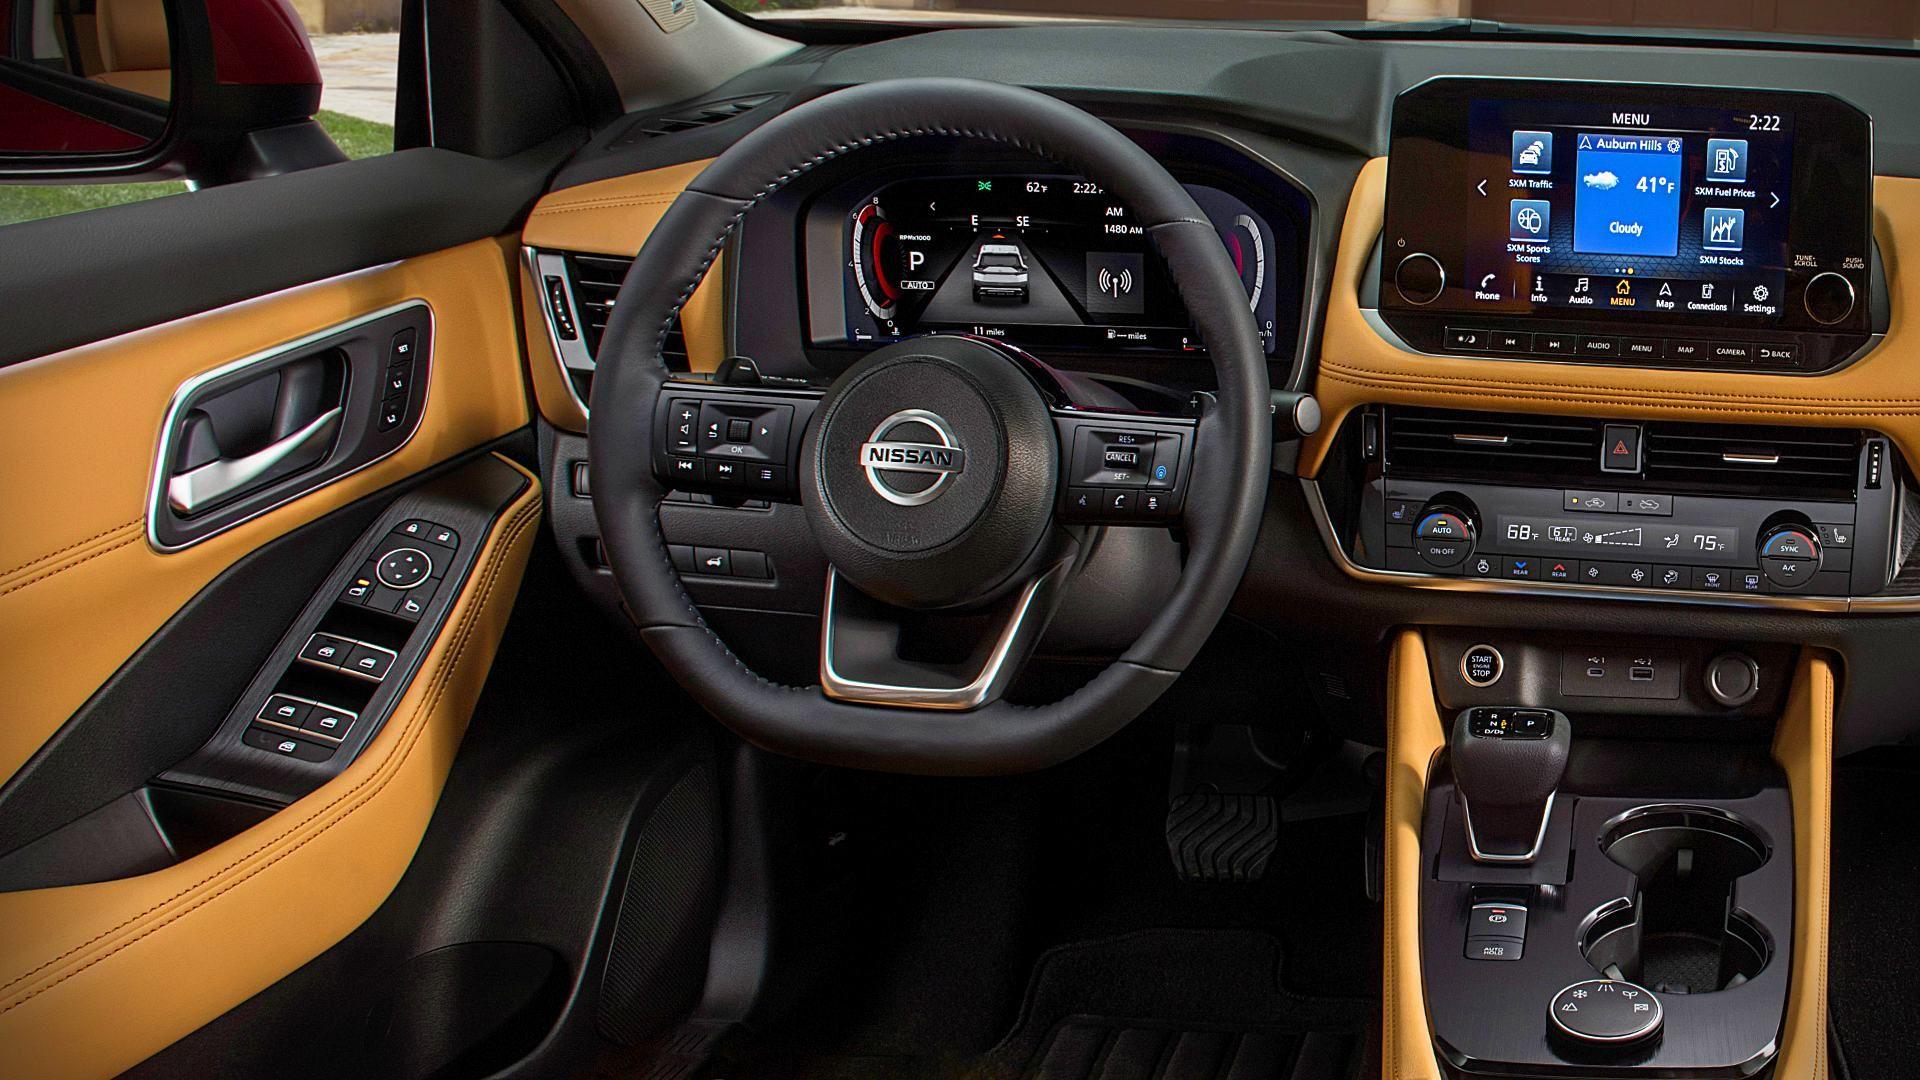 2021 Nissan Rogue Interior in 2020 Nissan rogue interior